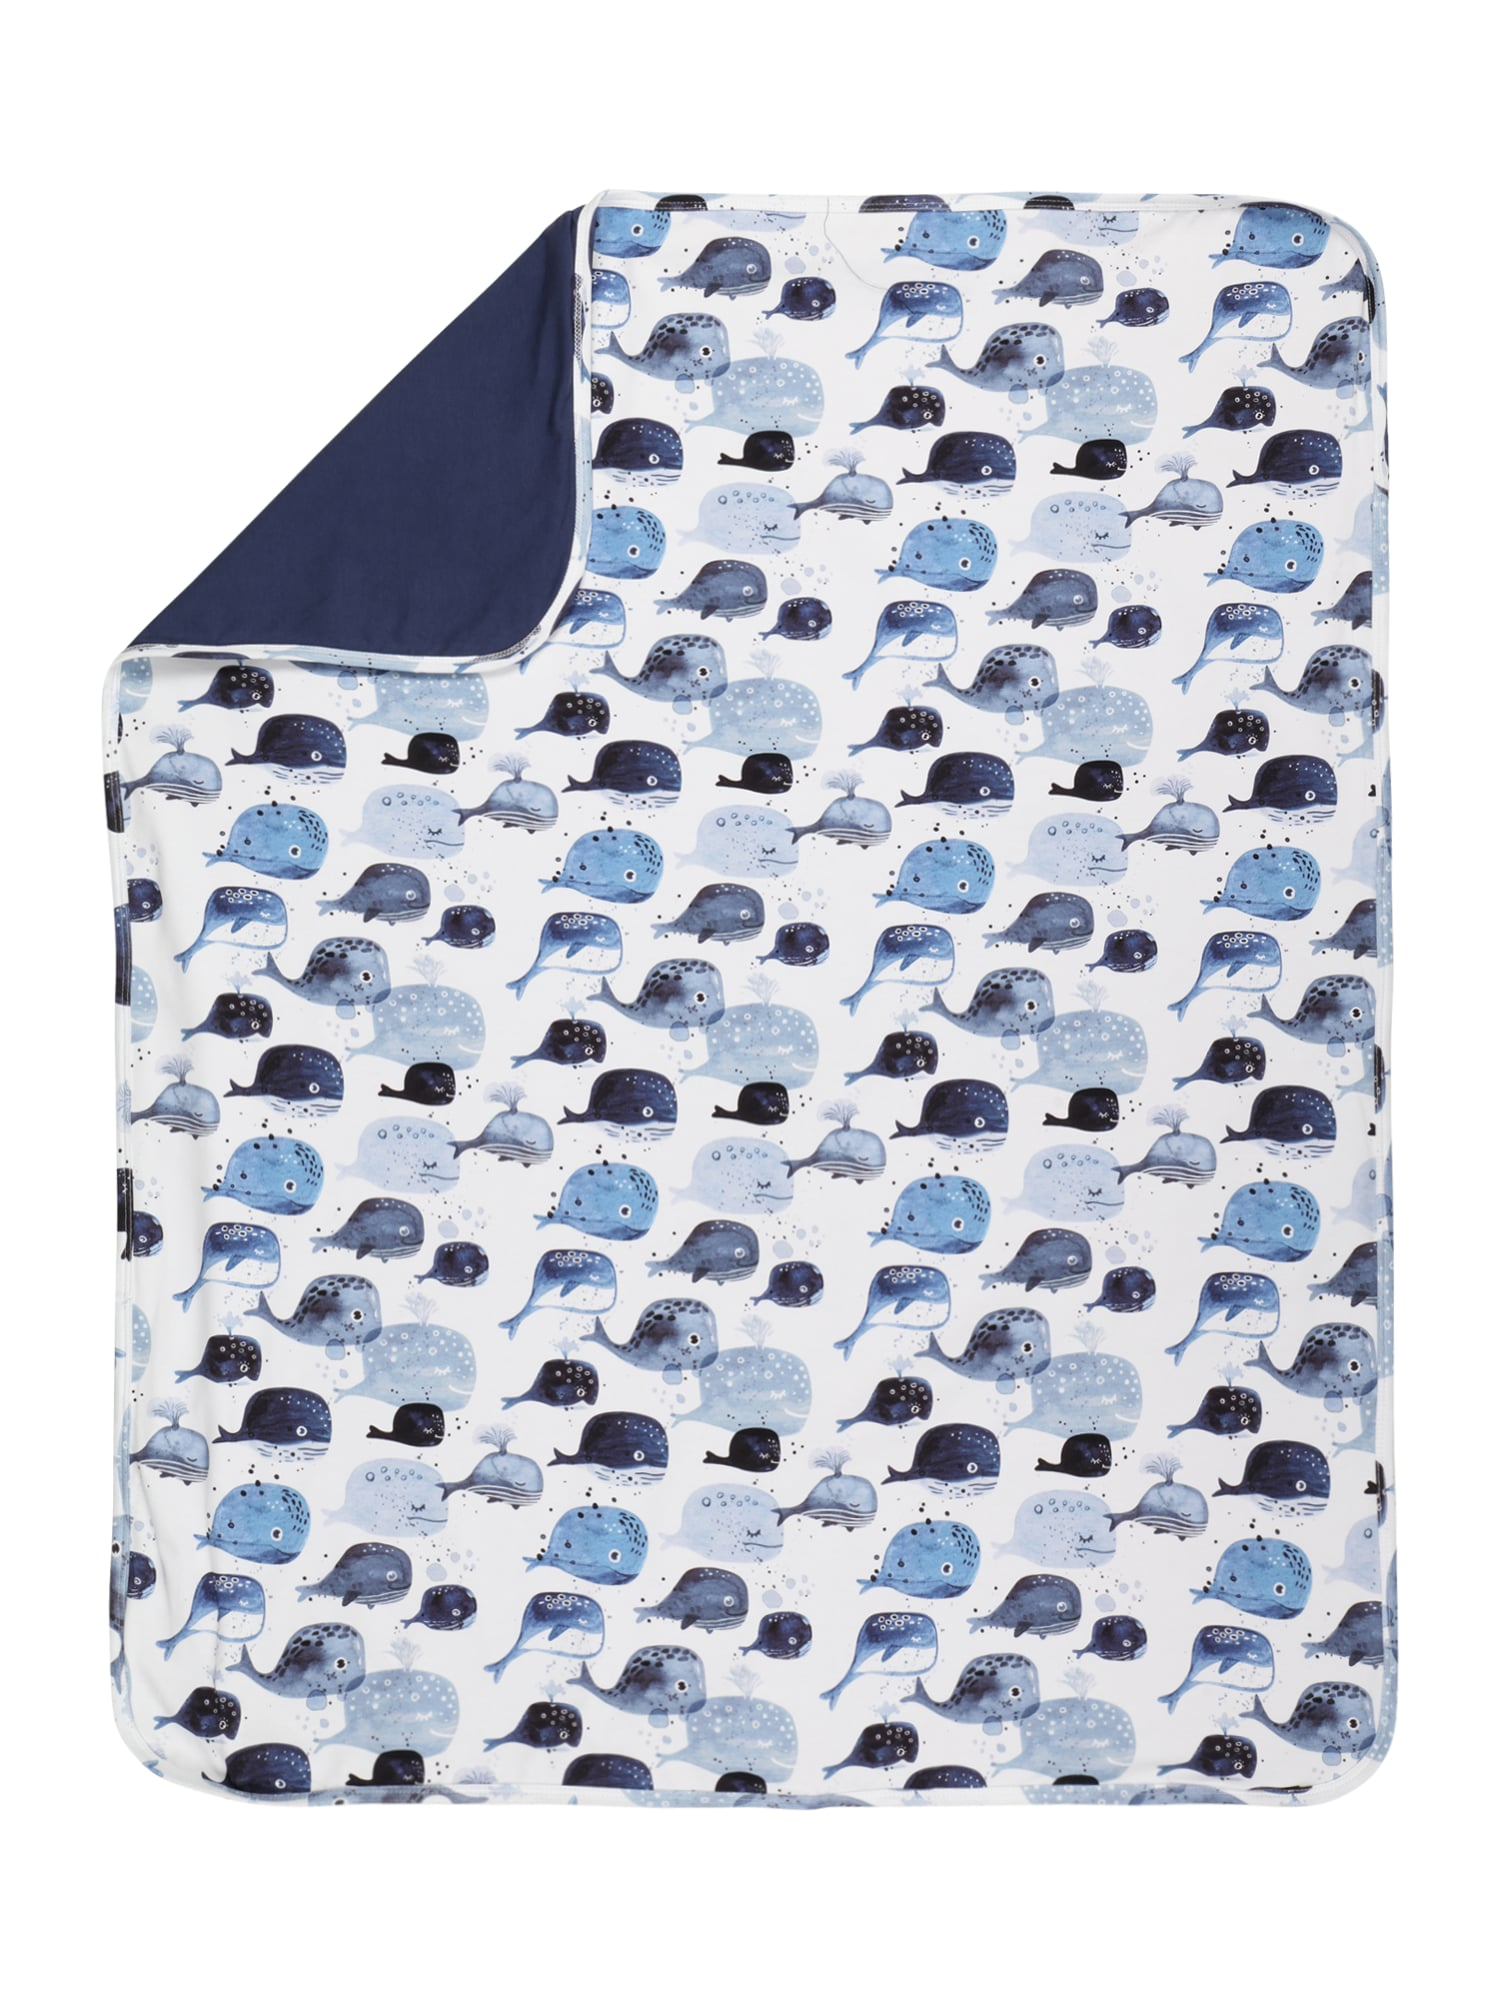 Walkiddy Kūdikio antklodė balta / šviesiai mėlyna / tamsiai mėlyna / mėlyna dūmų spalva